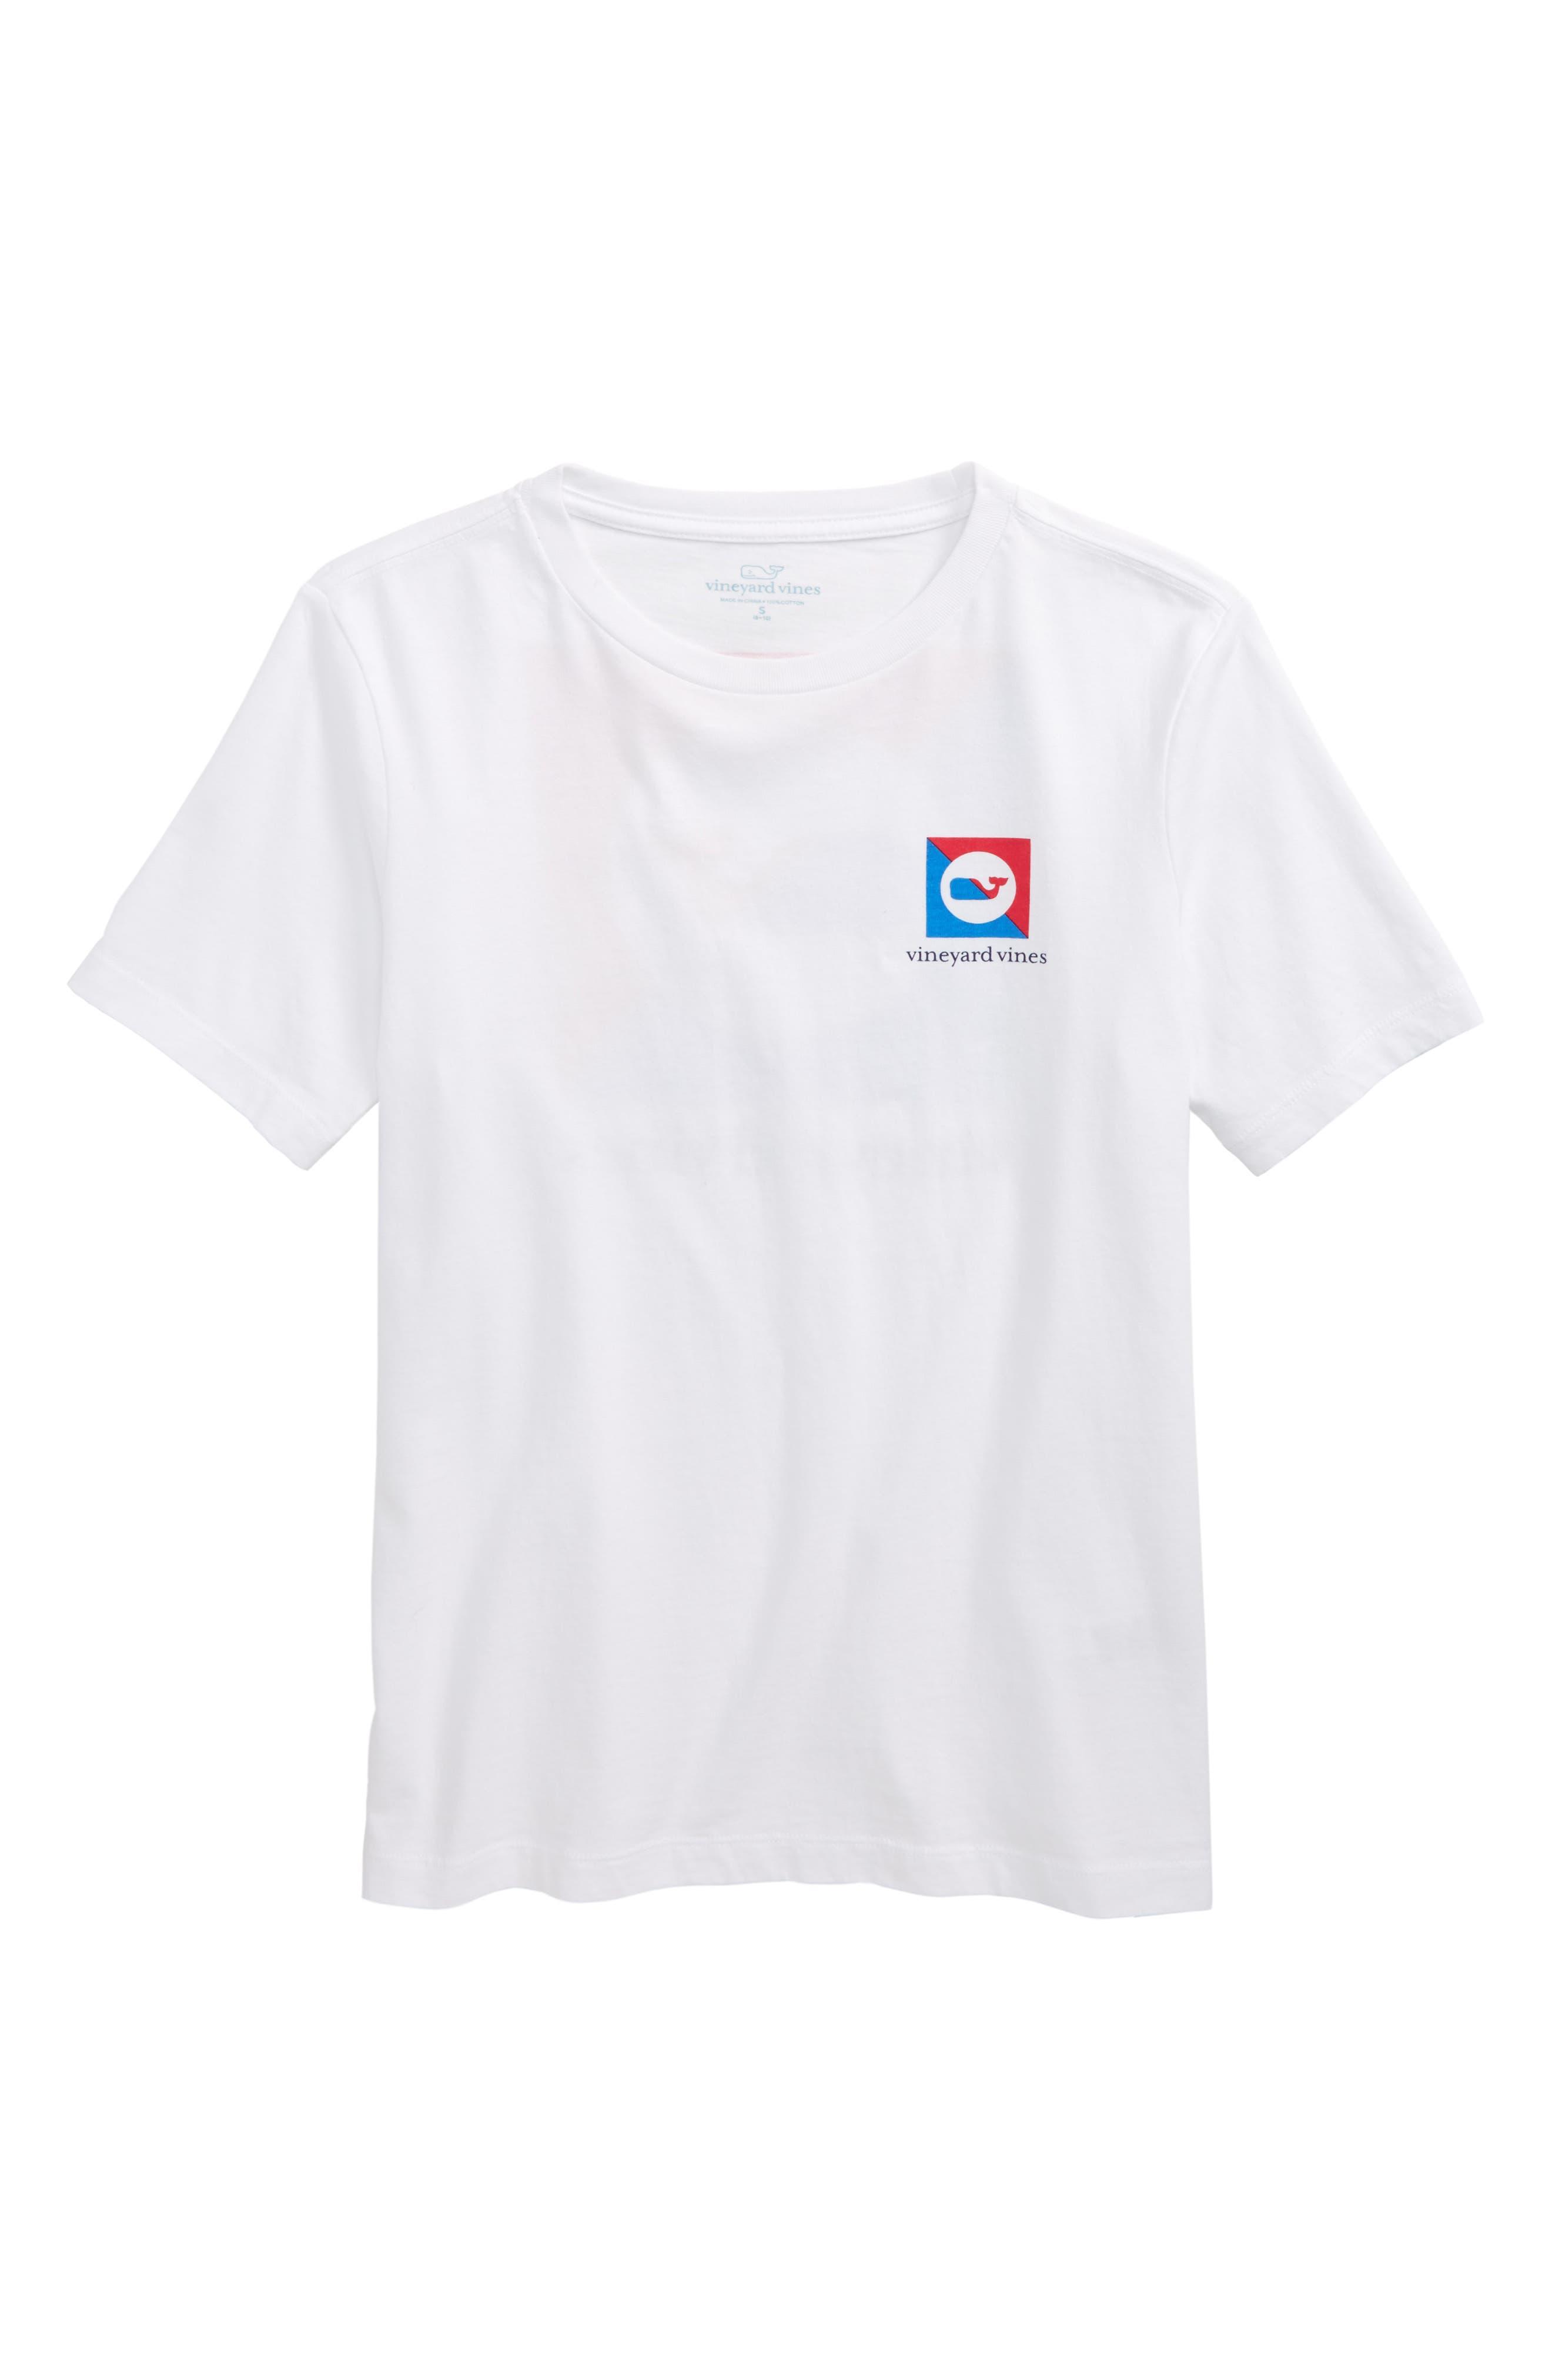 vineyard vines Burgee Logo Graphic T-Shirt (Big Boys)